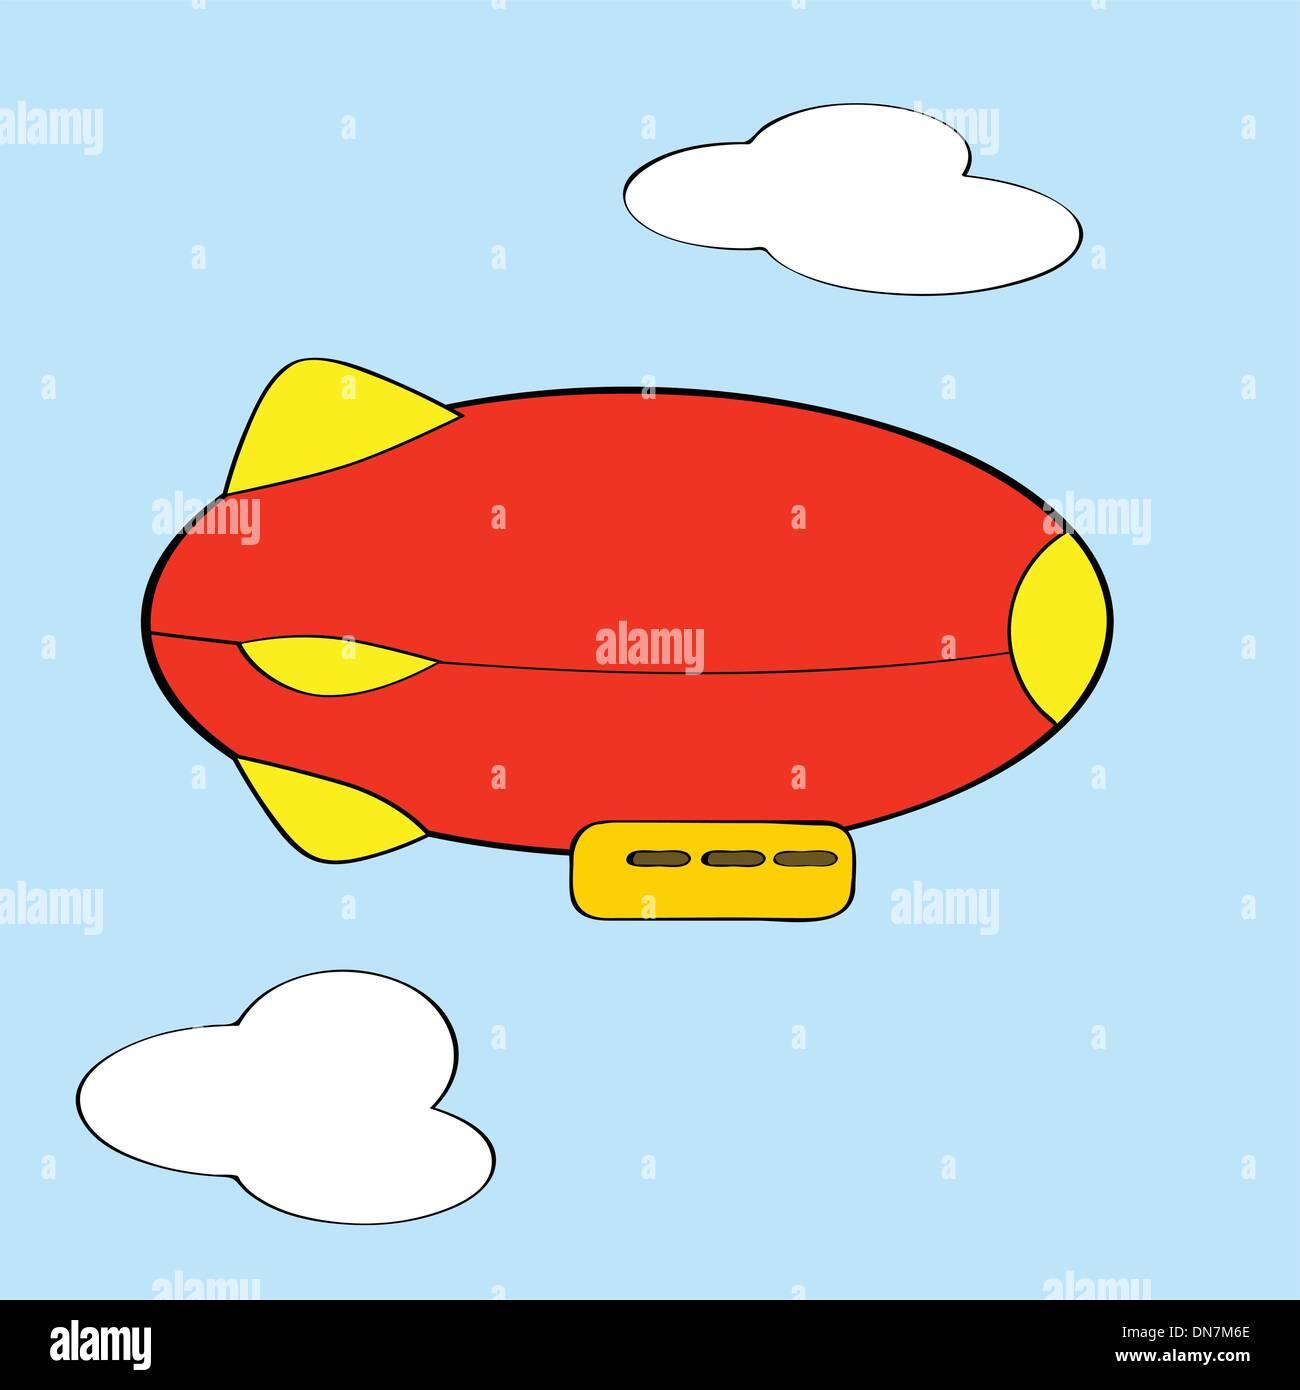 Cartoon blimp - Stock Image